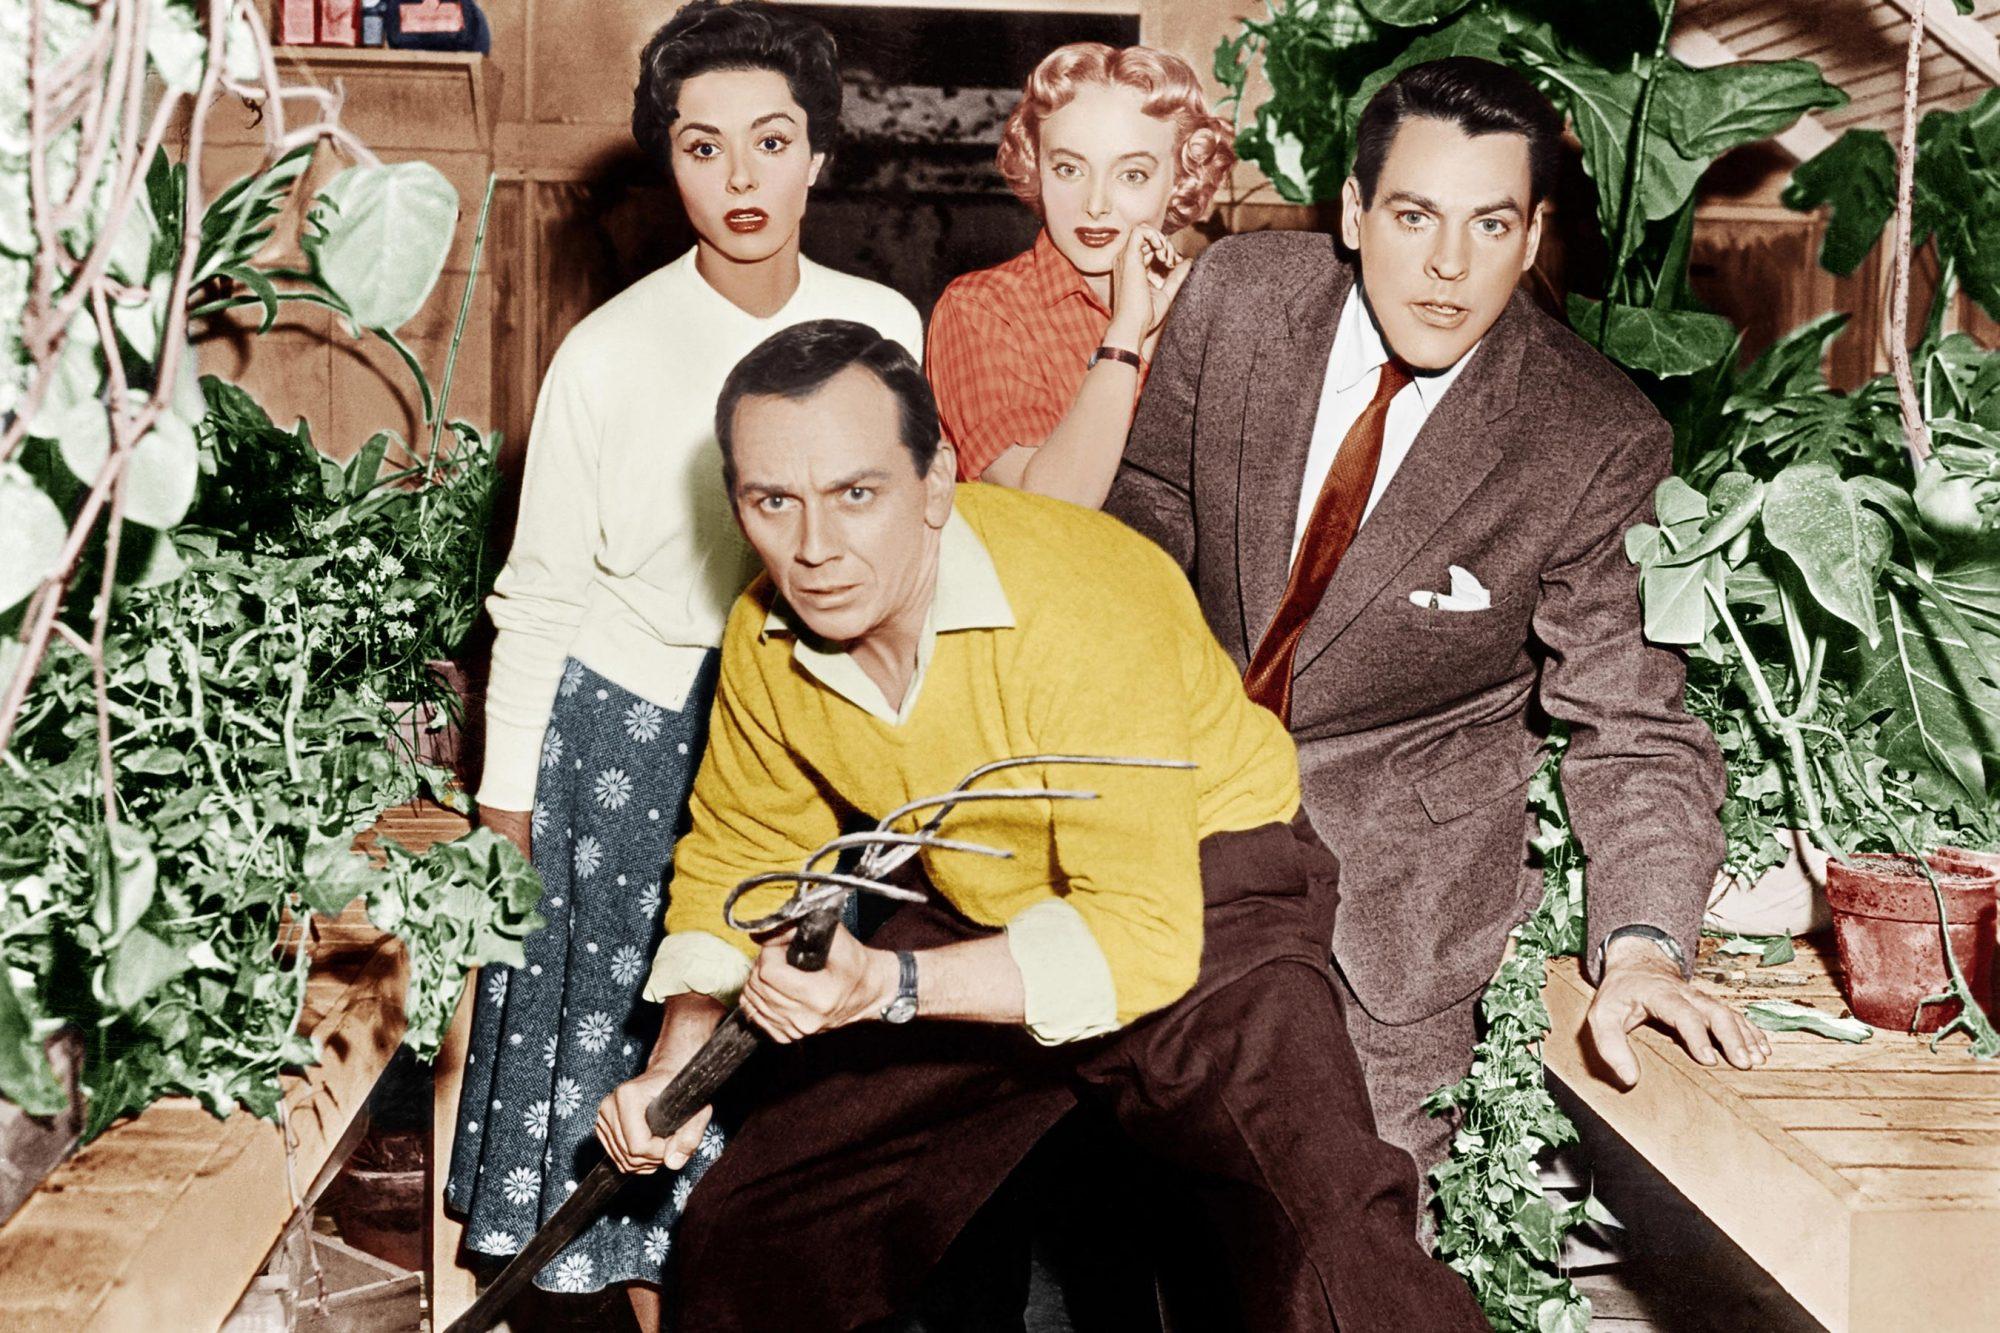 INVASION OF THE BODY SNATCHERS, from left: Dana Wynter, King Donovan, Carolyn Jones, Kevin McCarthy,